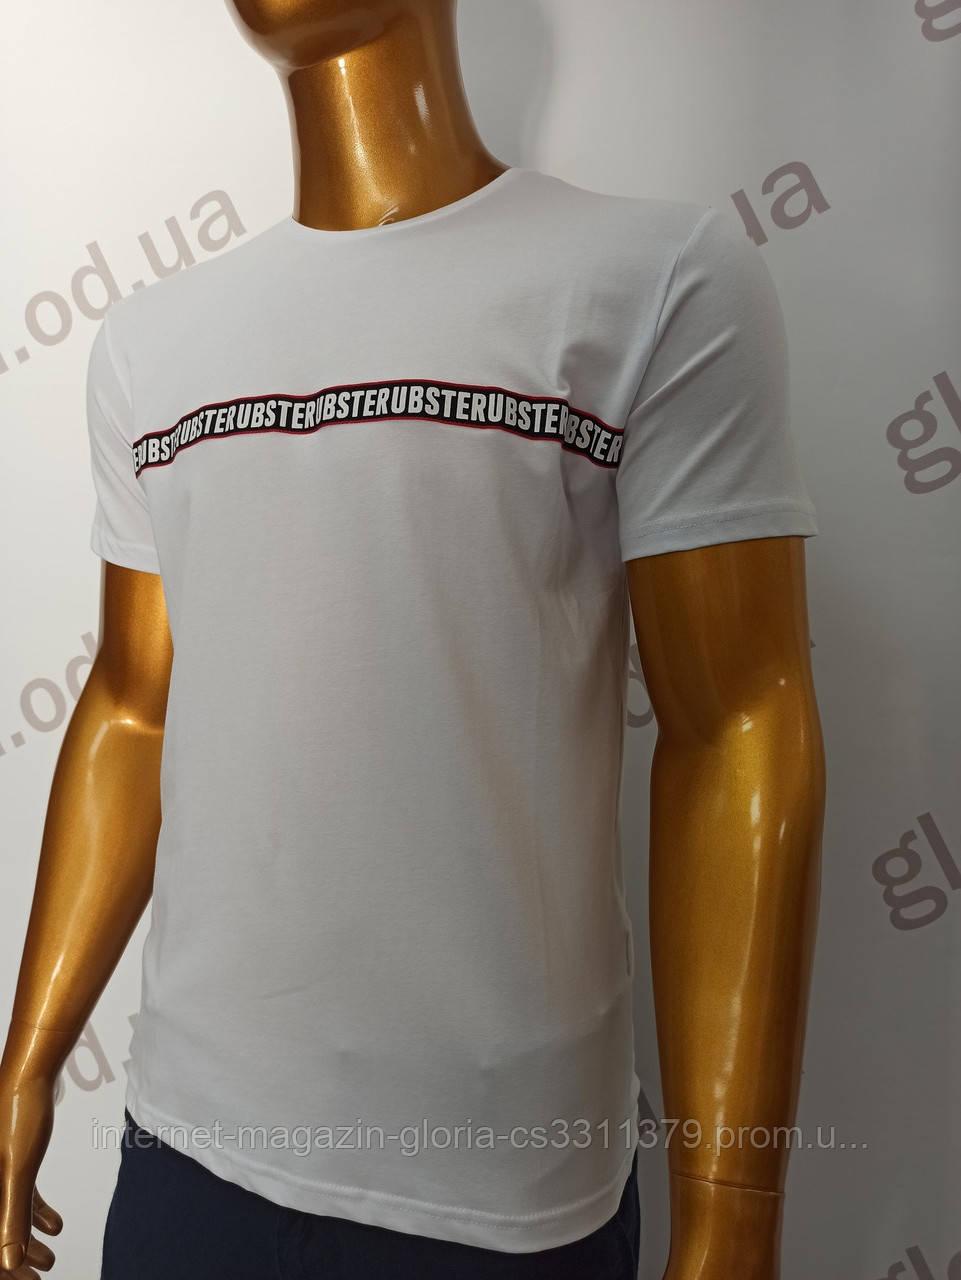 Мужская футболка MSY. 42668-8343(b). Размеры: M,L,XL,XXL.